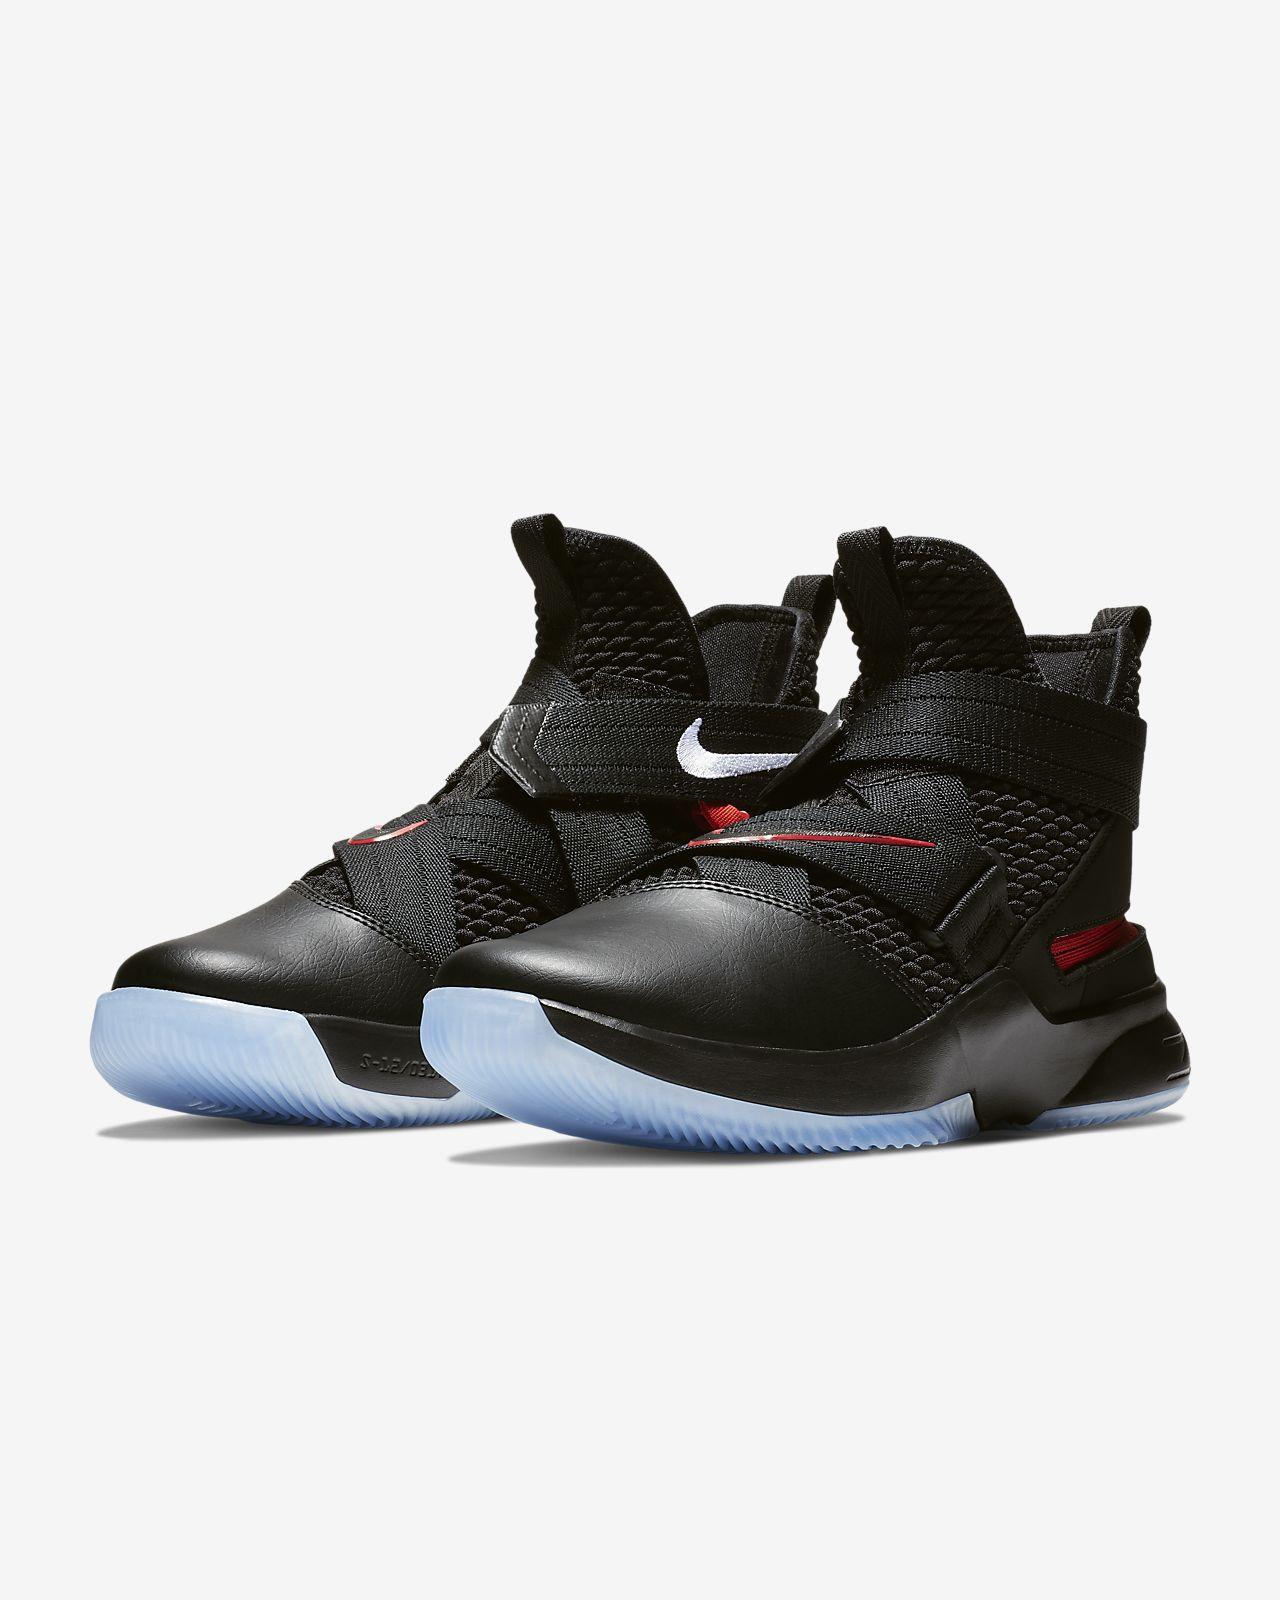 Chaussure de basketball LeBron Soldier 12 FlyEase pour Homme